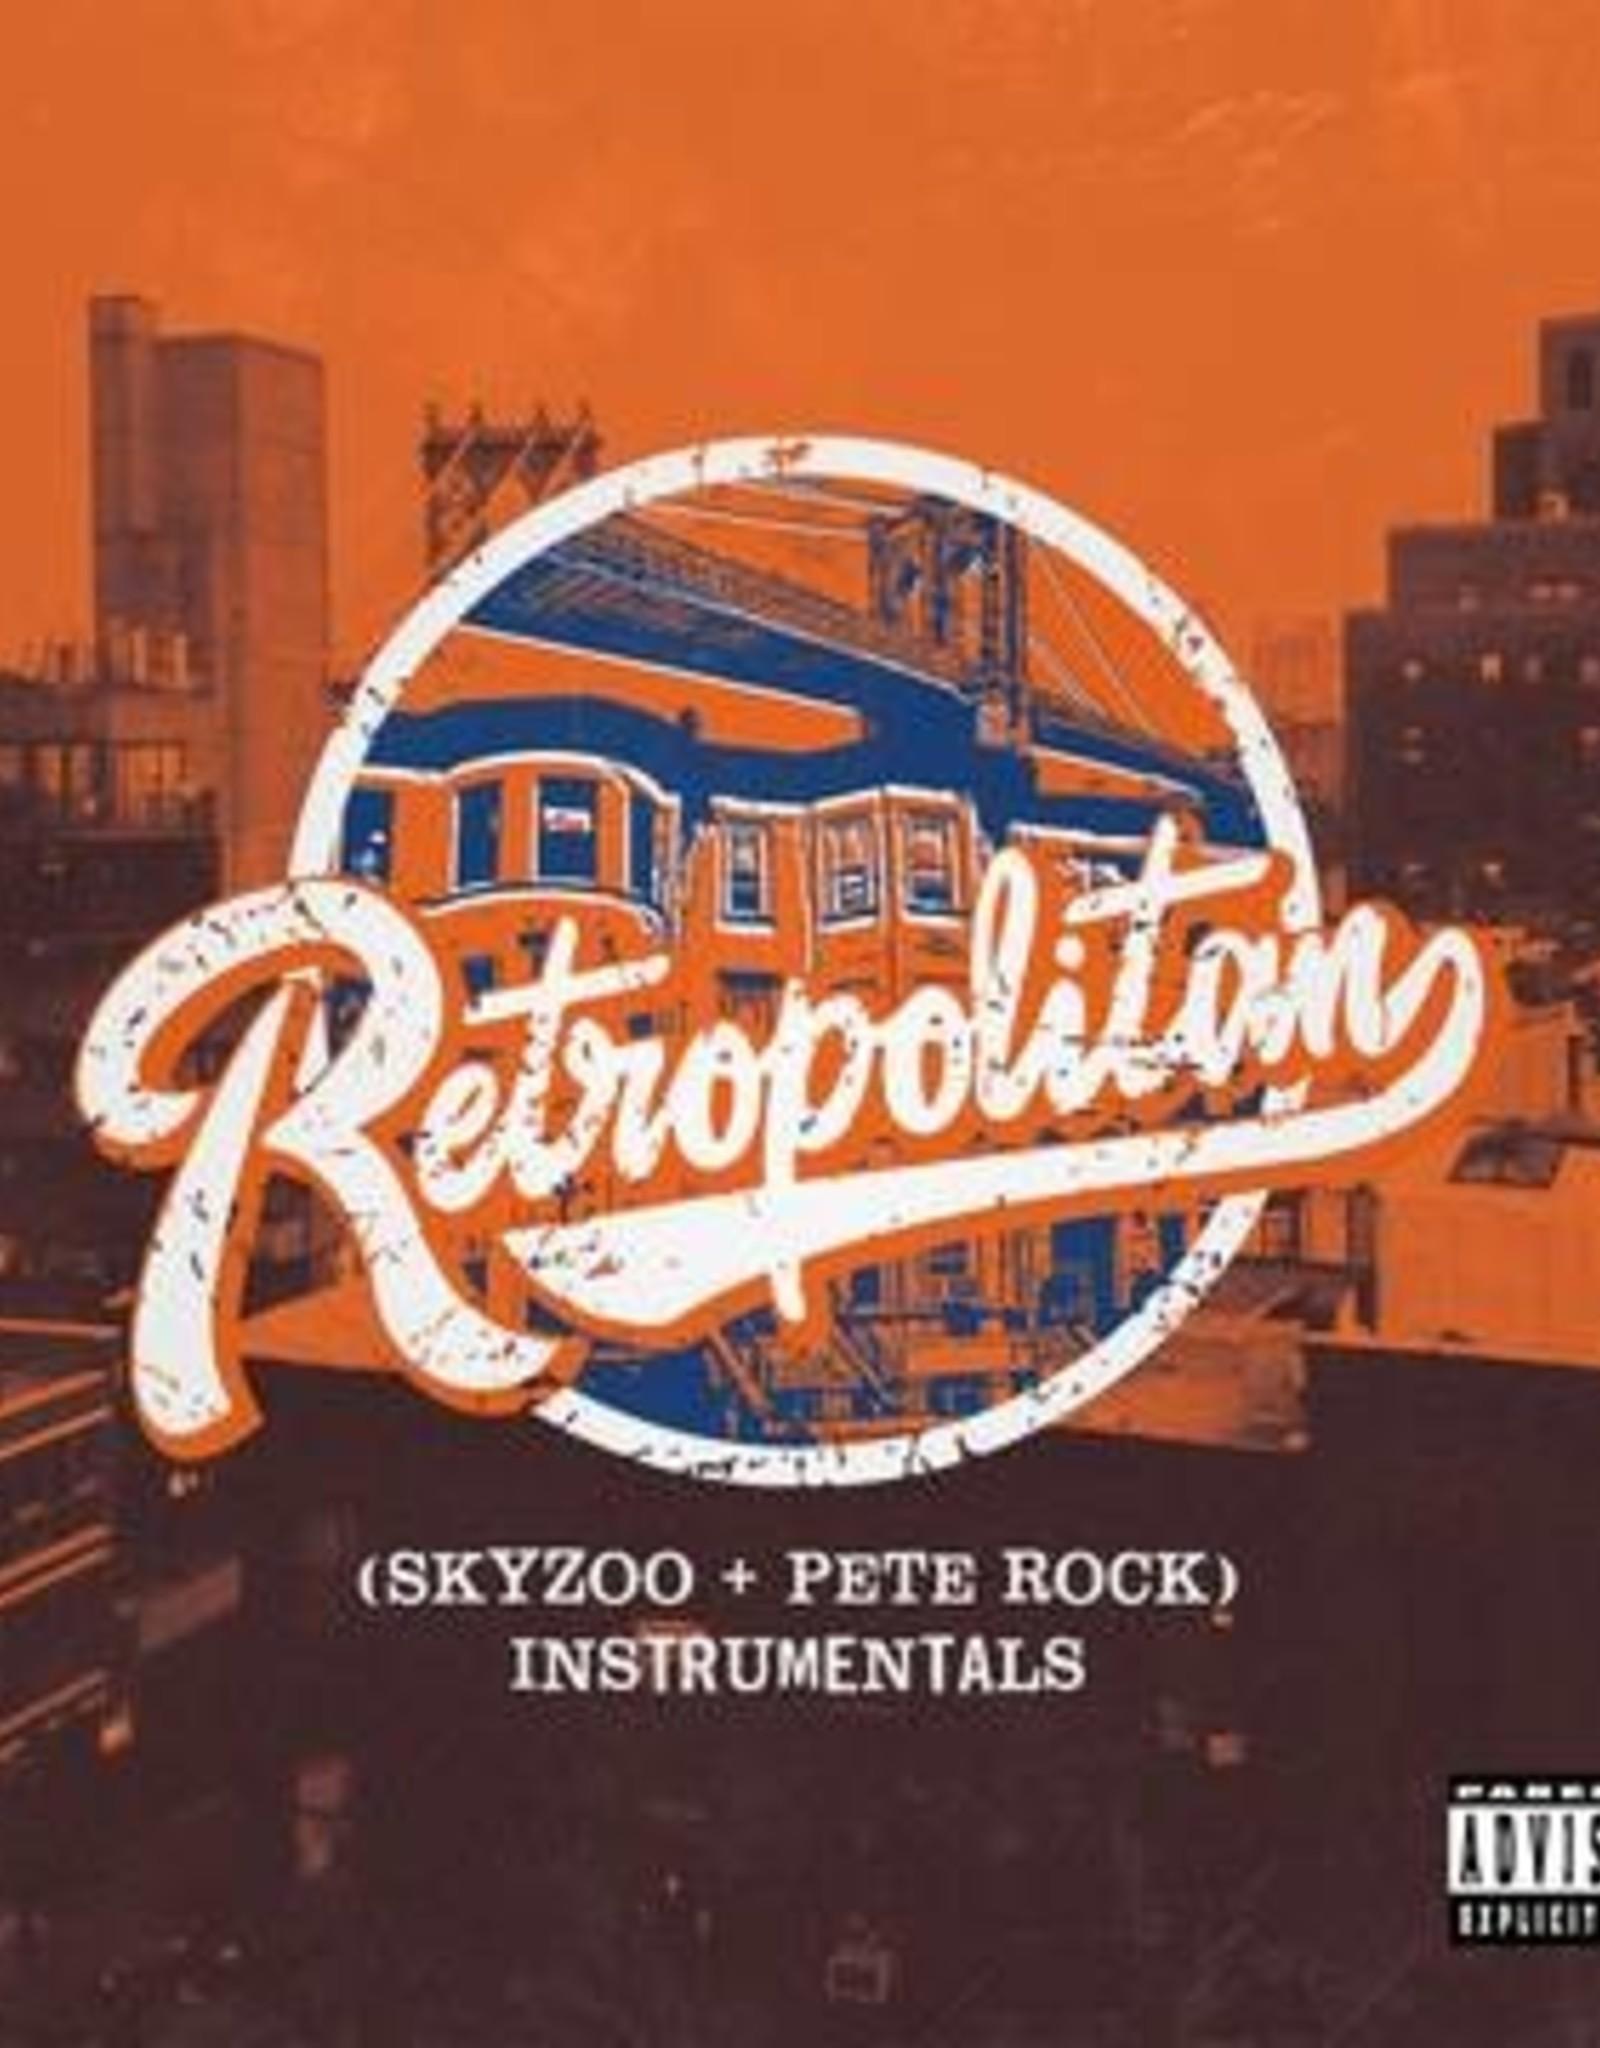 Pete Rock  /Skyzoo - Retropolitan (Instrumentals) (Clear Orange With White Heavy Splatter Vinyl) (RSD 2020)